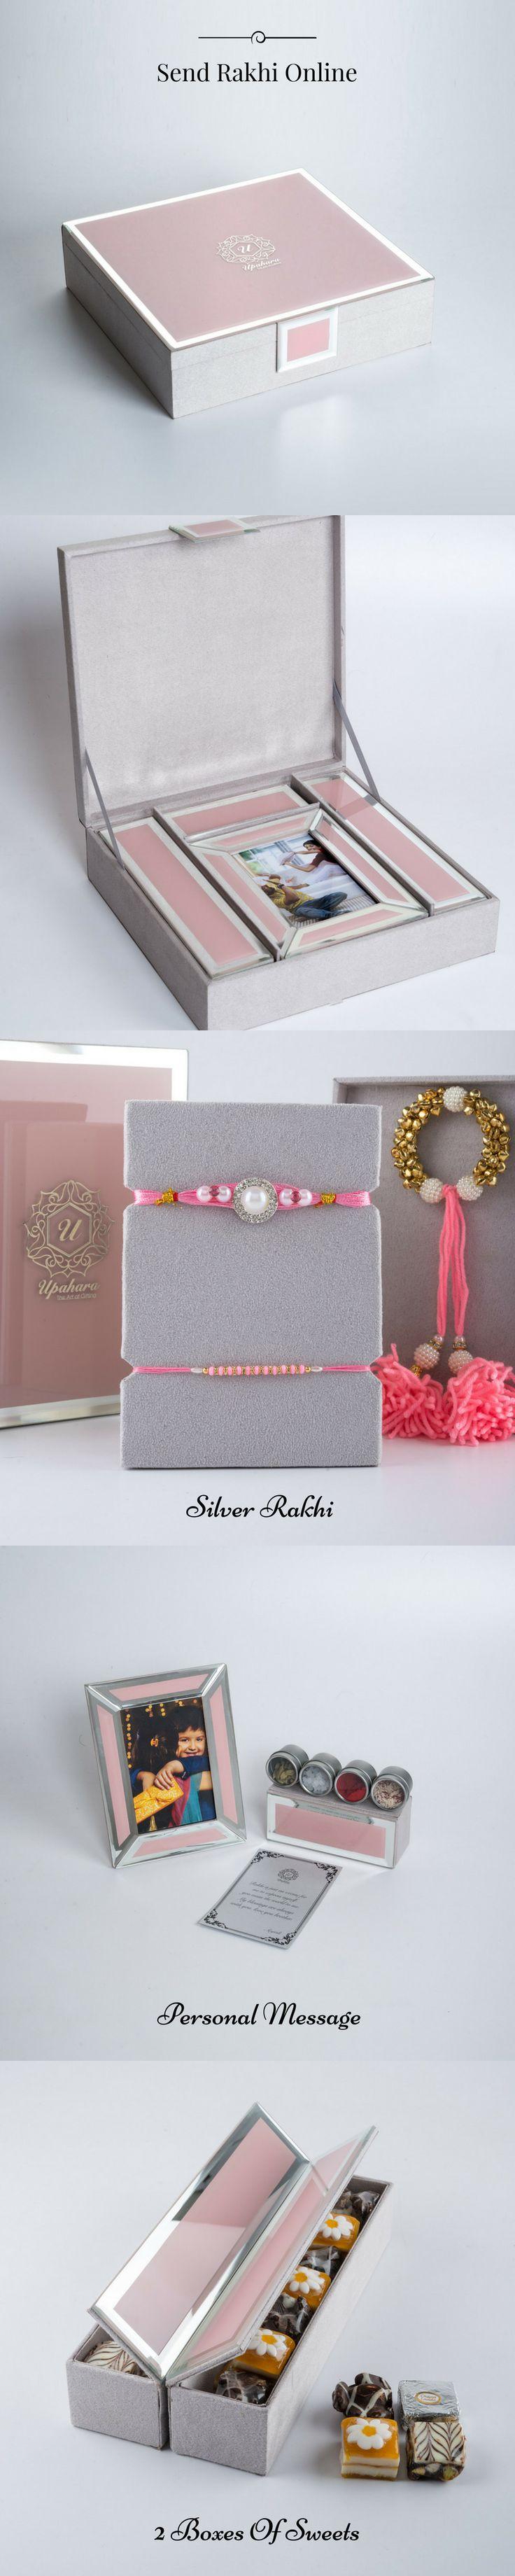 Luxury Rakhi Collection #sendrakhitousa Send Rakhi Online #sendrakhitoUK #PremiumRakhi #StoneRakhi #OnlineRakhi #upahararakhi #sendrakhiindia #sendrakhiAustralia #BhabhiRakhi #goldrakhiusa #pearlrakhi #sendrakhitodubai #sendrakhitokuwait #worldwidesell #sandalwood #sandalwoodrakhi #sendrakhi #online #silverrakhi #gold #rakhi #onlineshopping #shopping #fordaugher #chandanrakhi